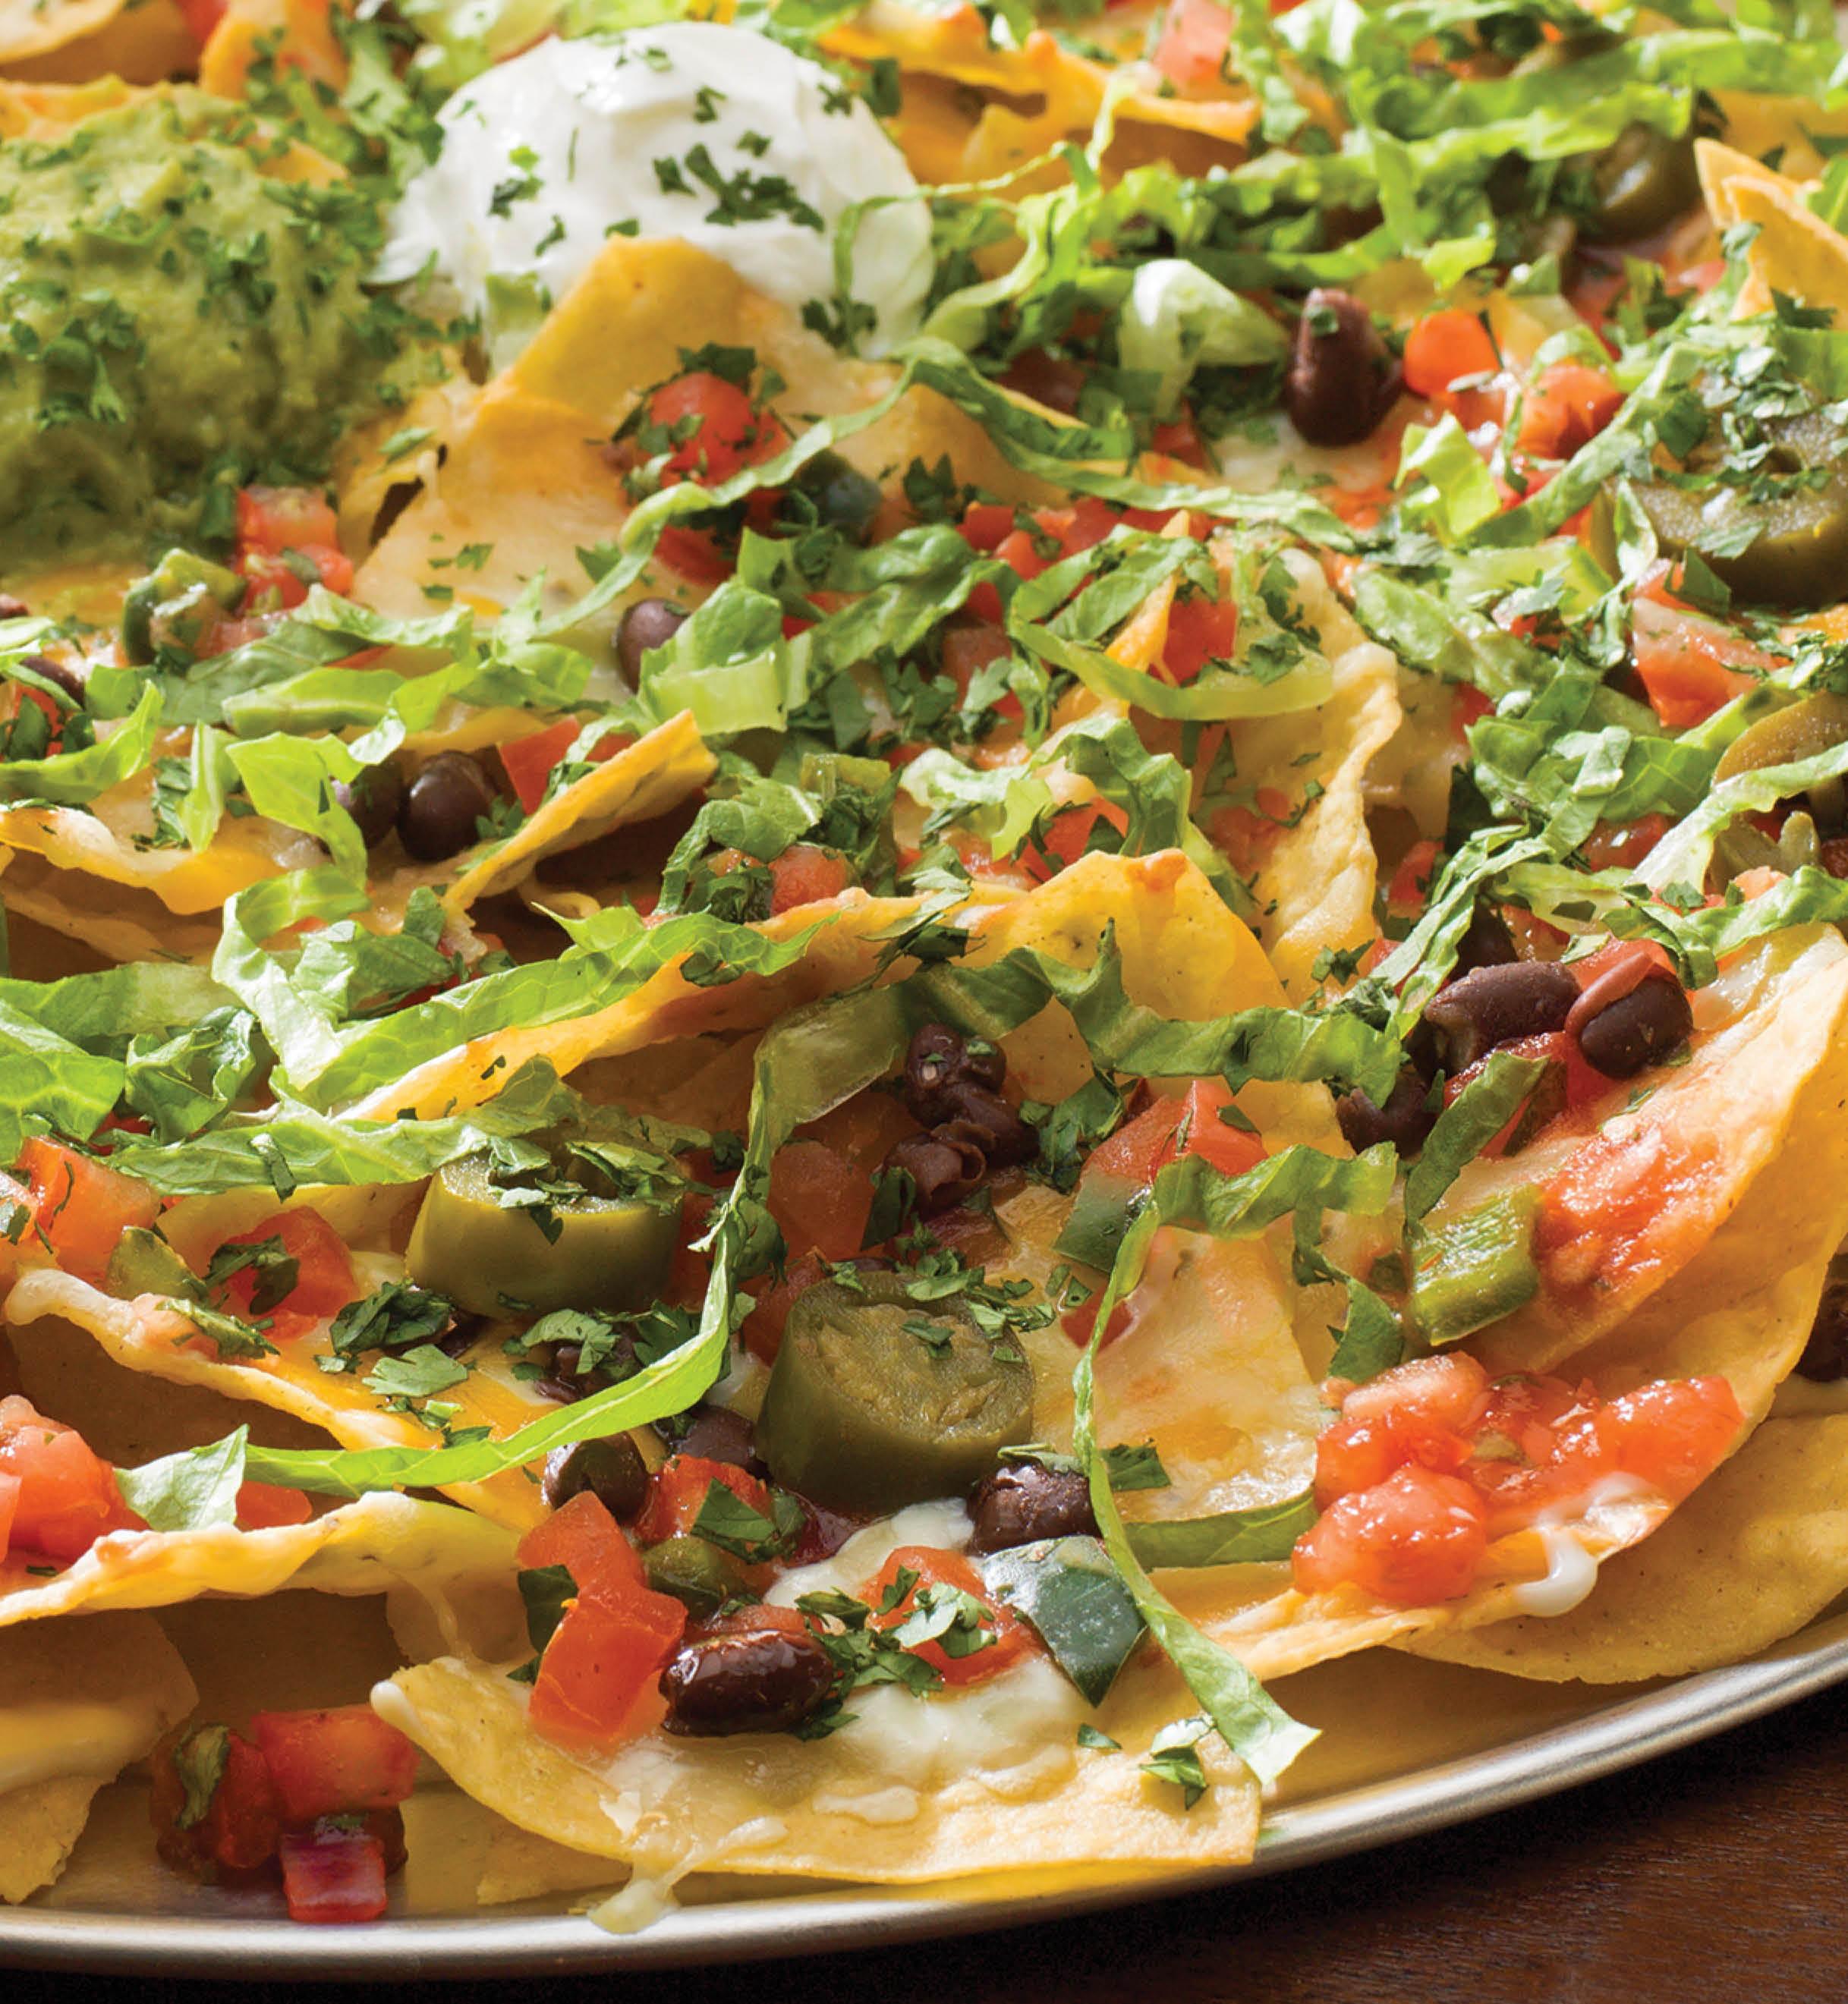 nachos and tex mex